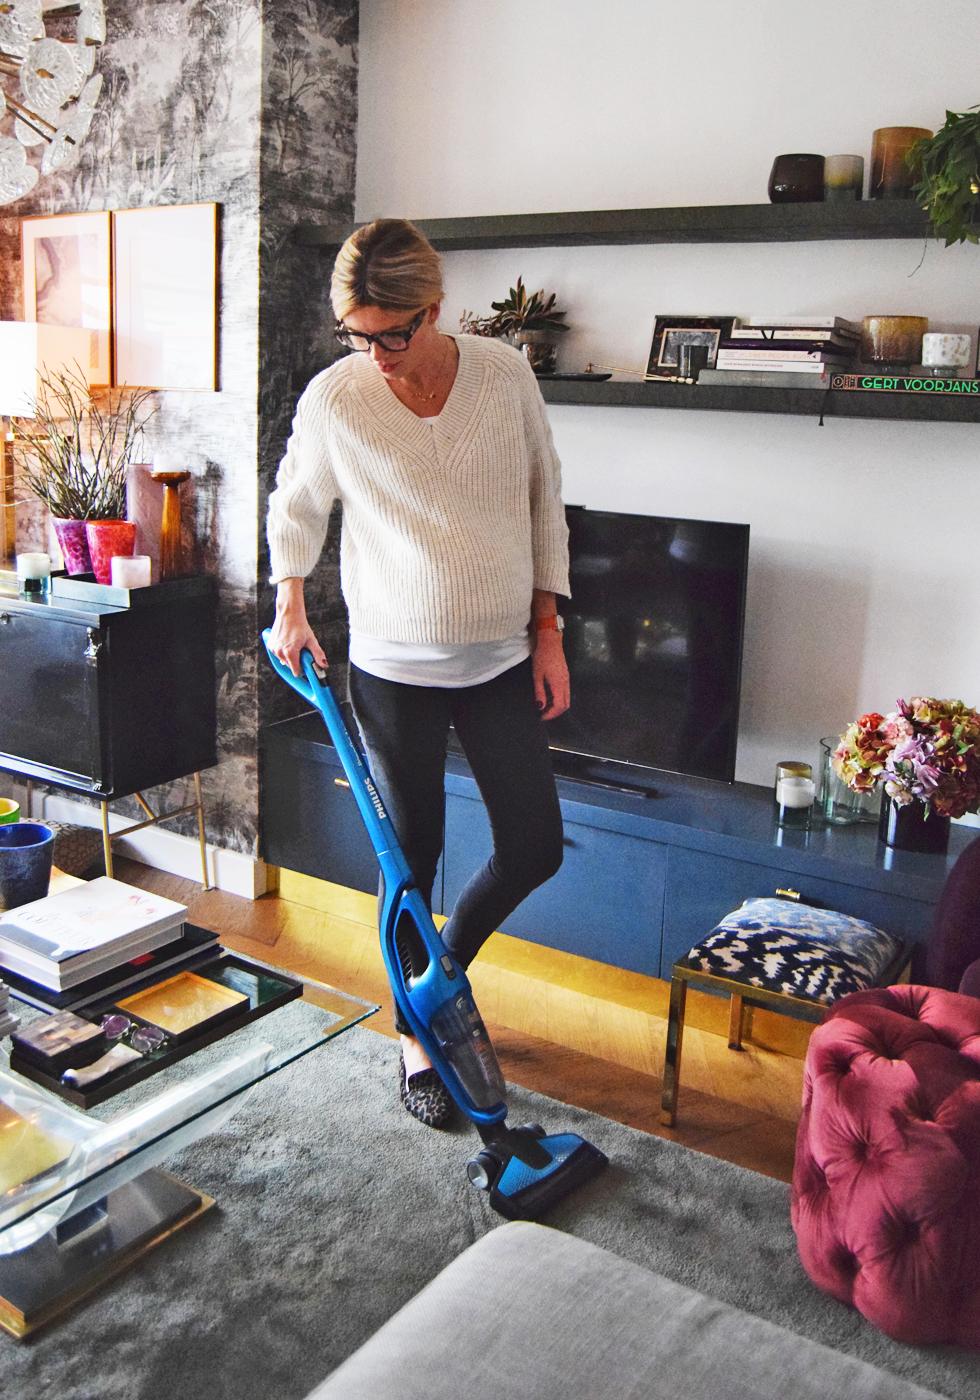 Philips, Floorcare, PowerPro Aqua, vacuum cleaner, cordless, review